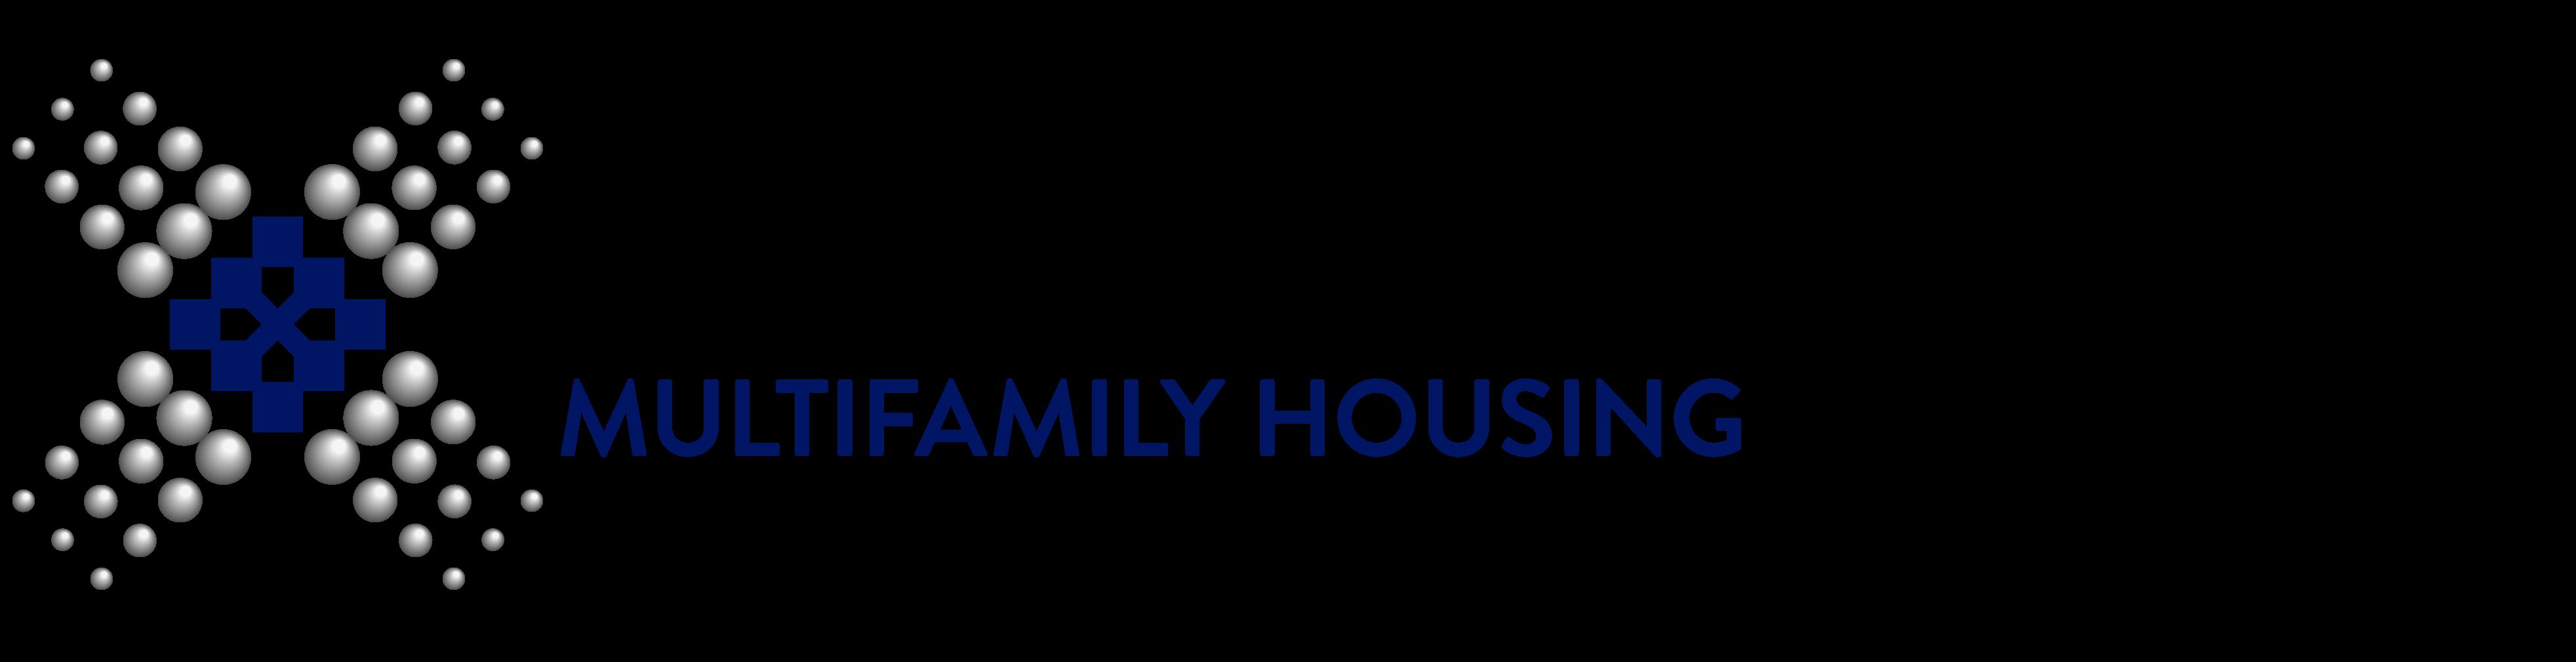 ExecutiveXchange Multifamily _ Transparent.png